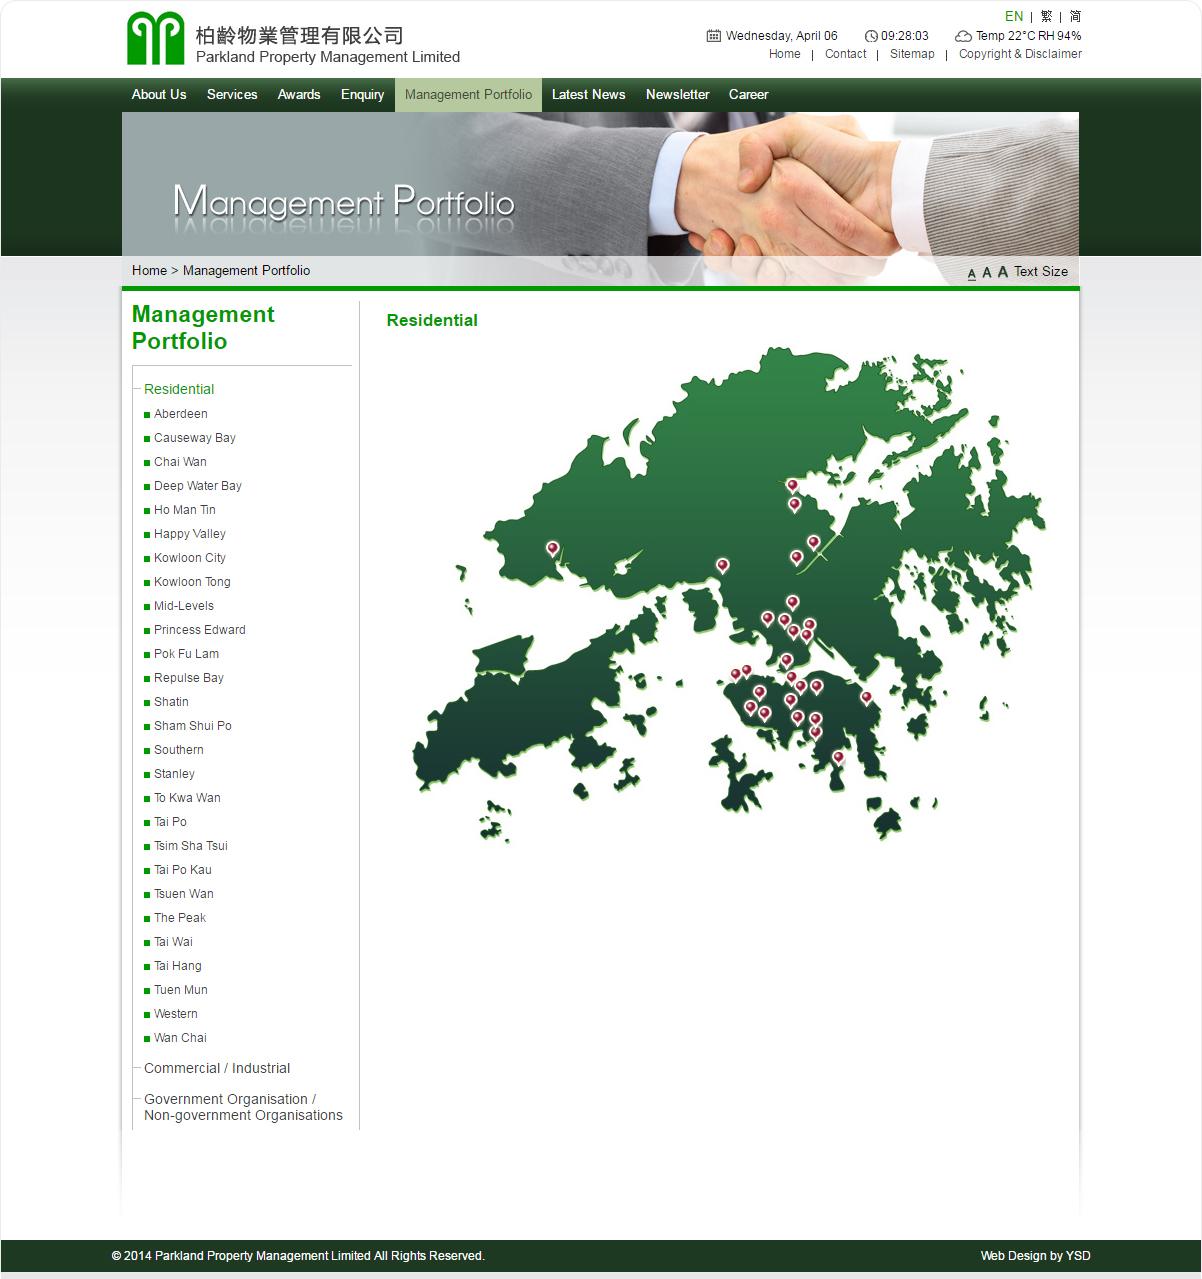 Parkland Property Management Limited